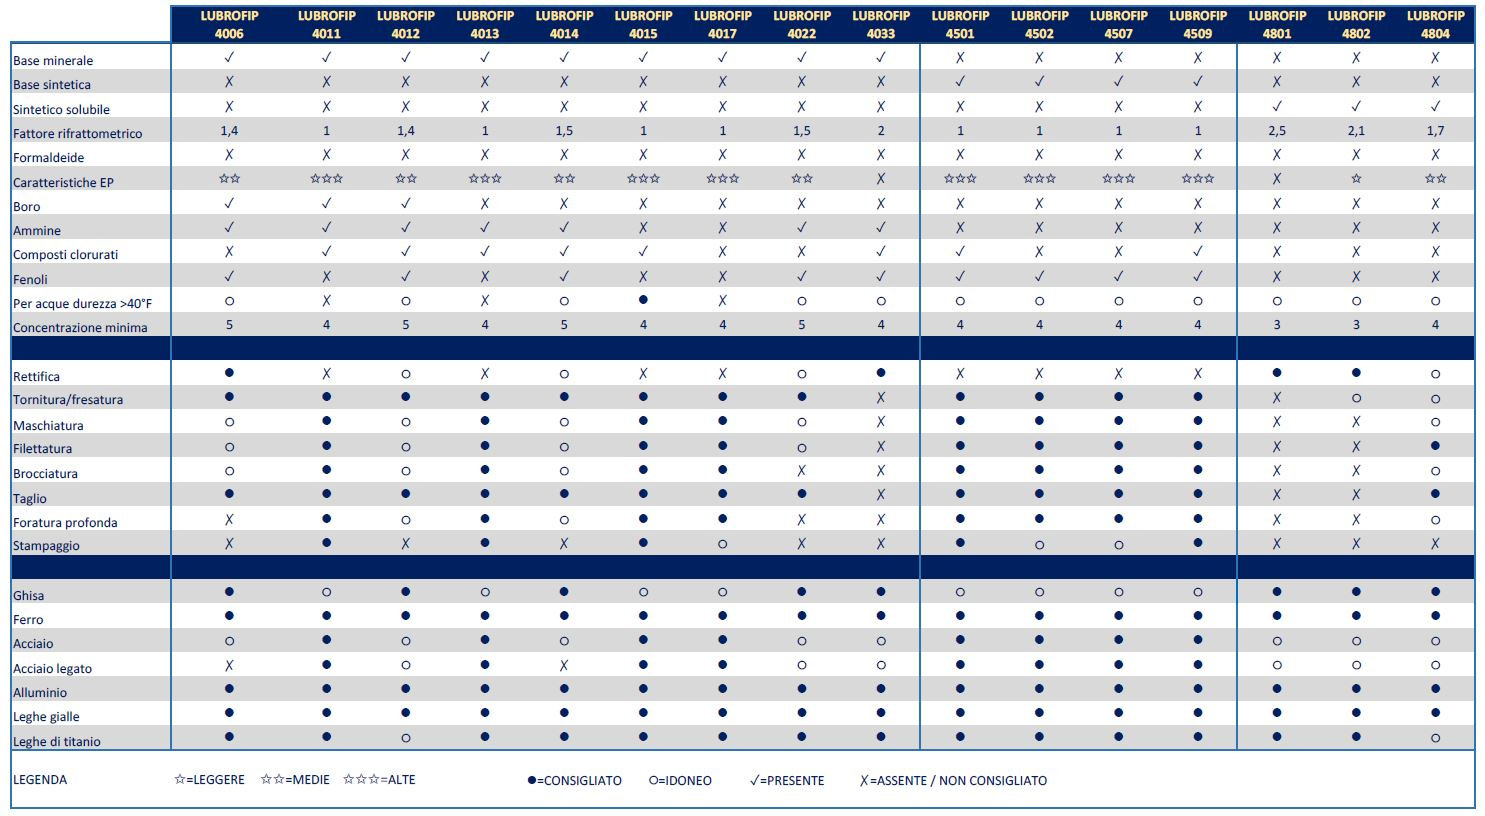 tabella prodotti emu DEF  ok.JPG